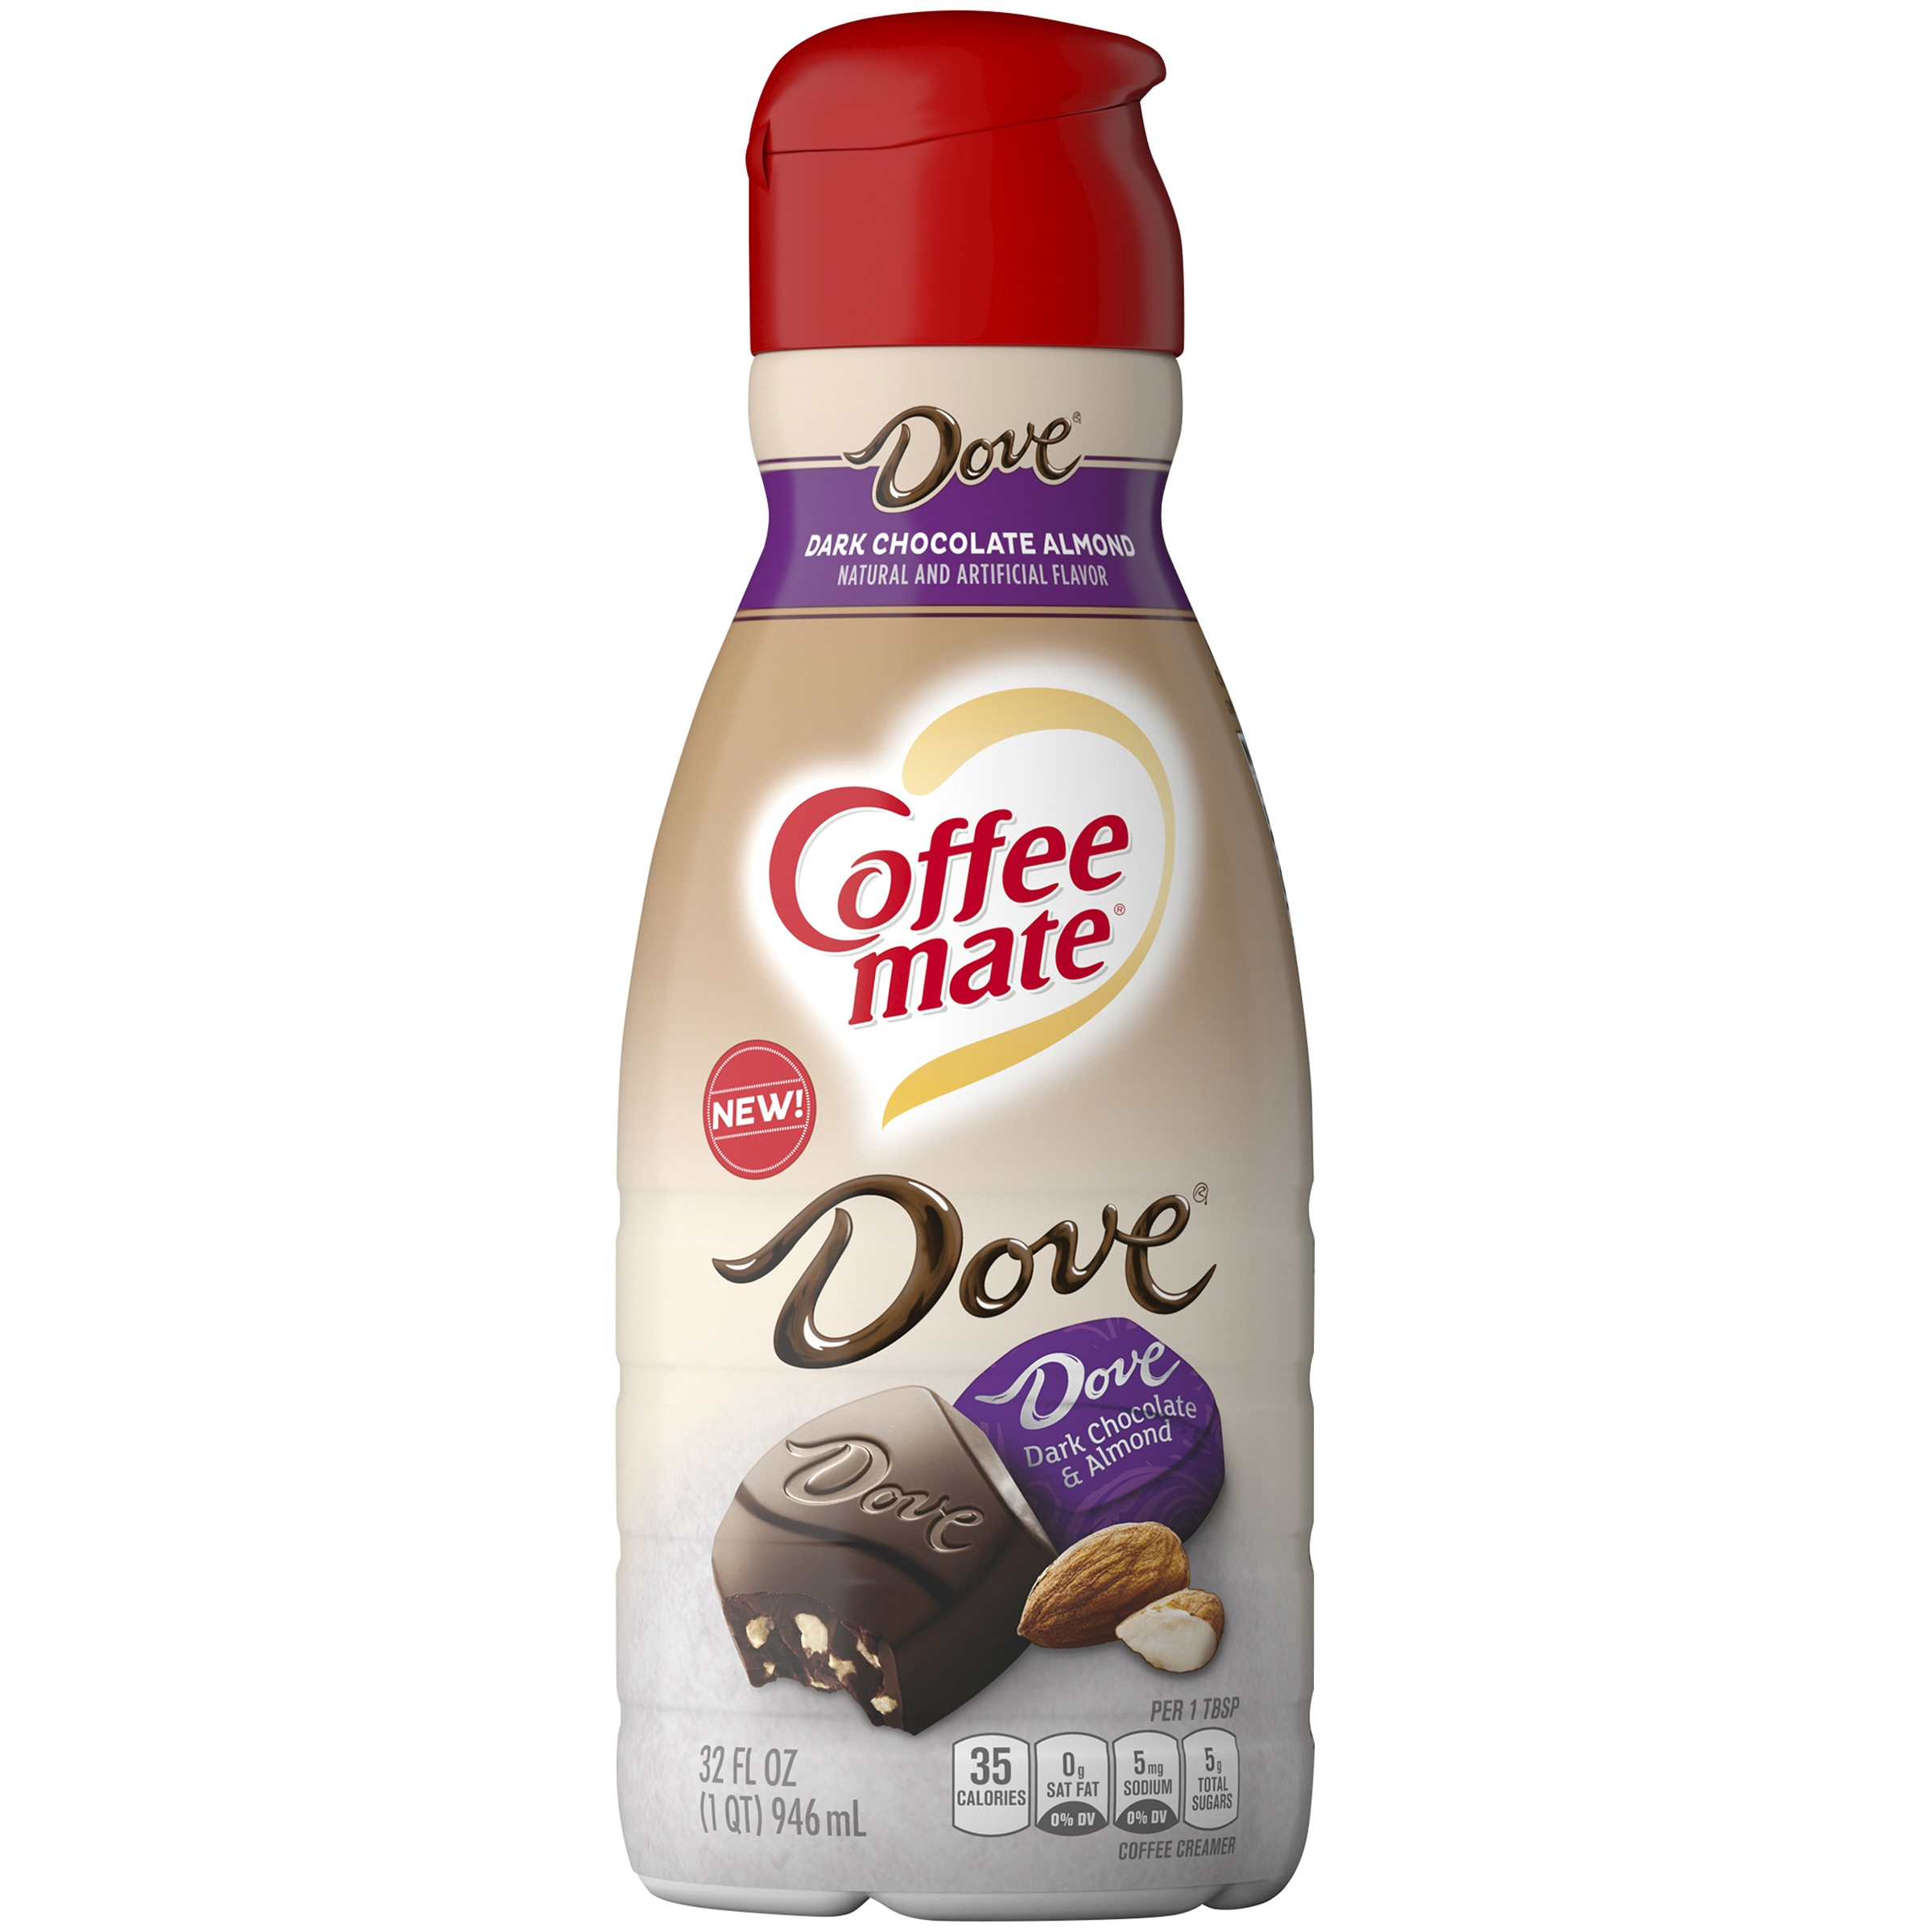 COFFEE MATE DOVE Dark Chocolate Almond Flavored Liquid Coffee Creamer, 32 Fl. Oz. Bottle | Non-Dairy, Lactose-Free, Cholesterol-Free, Gluten-Free Creamer